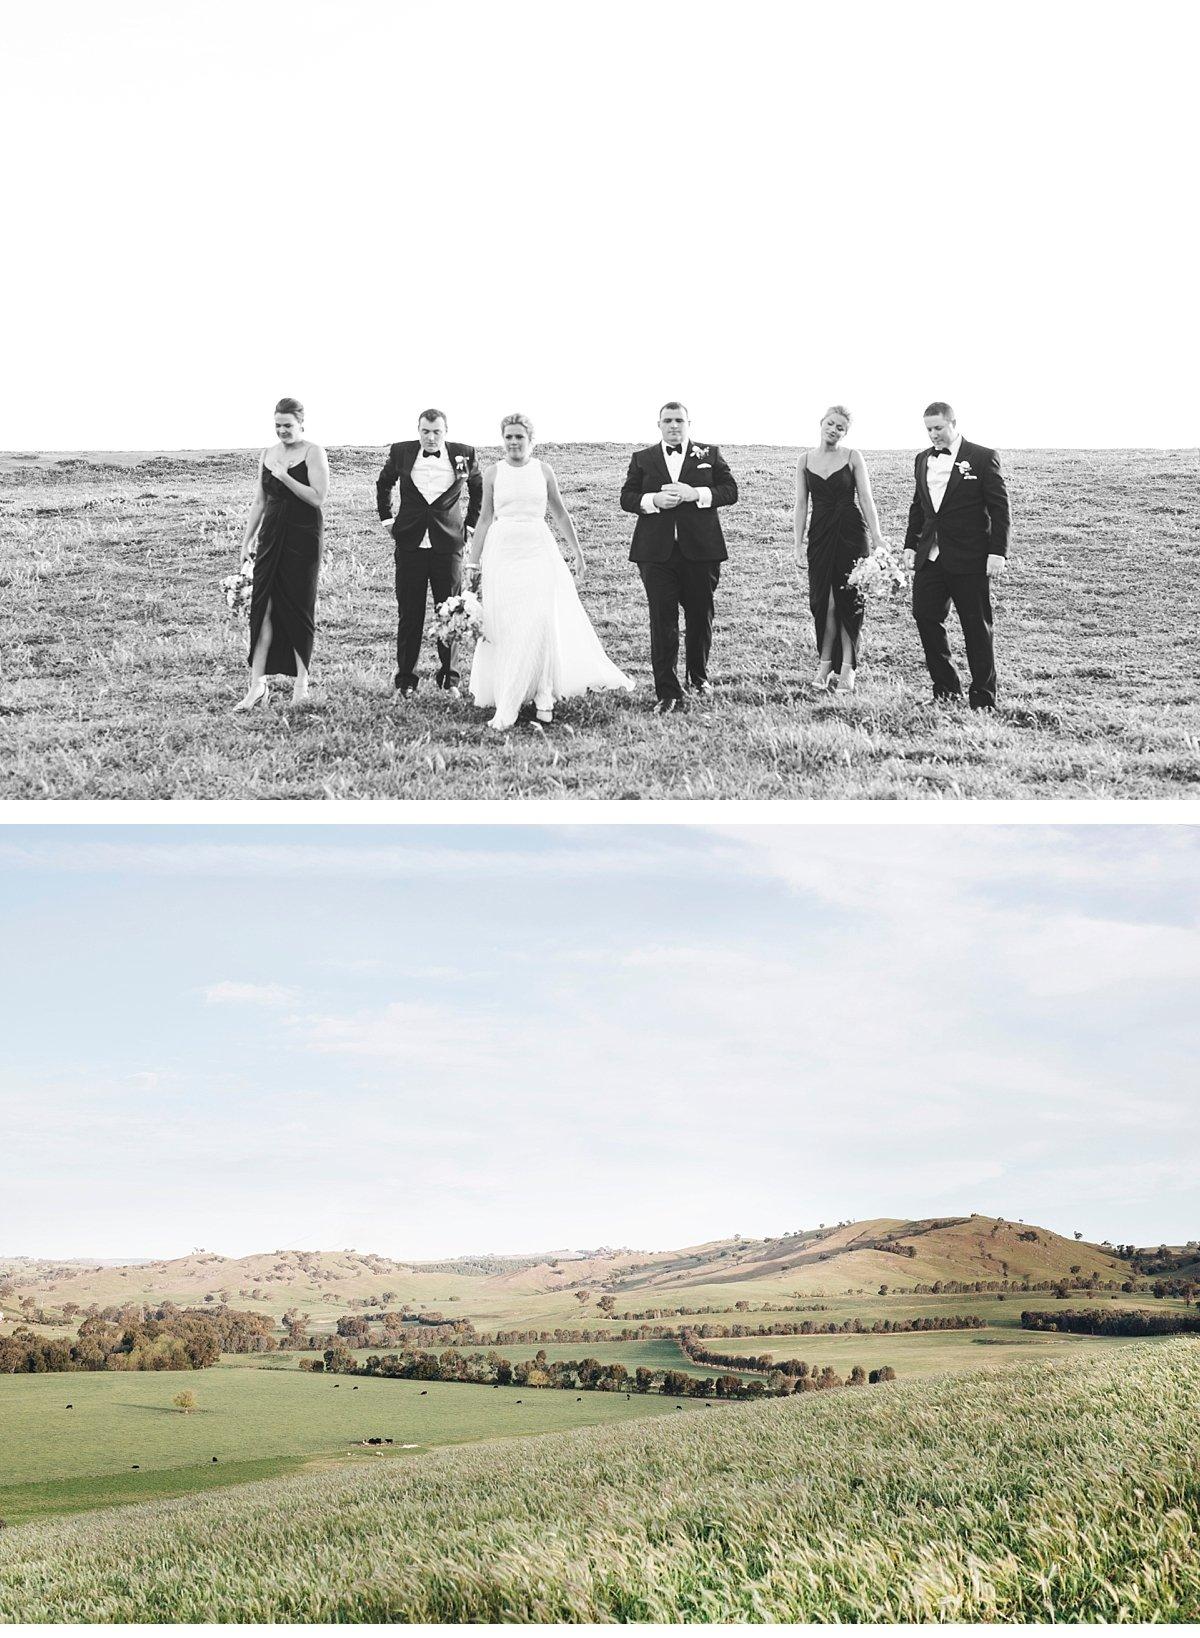 Wagga Wagga Wedding Photographer at Jugiong NSW_0558